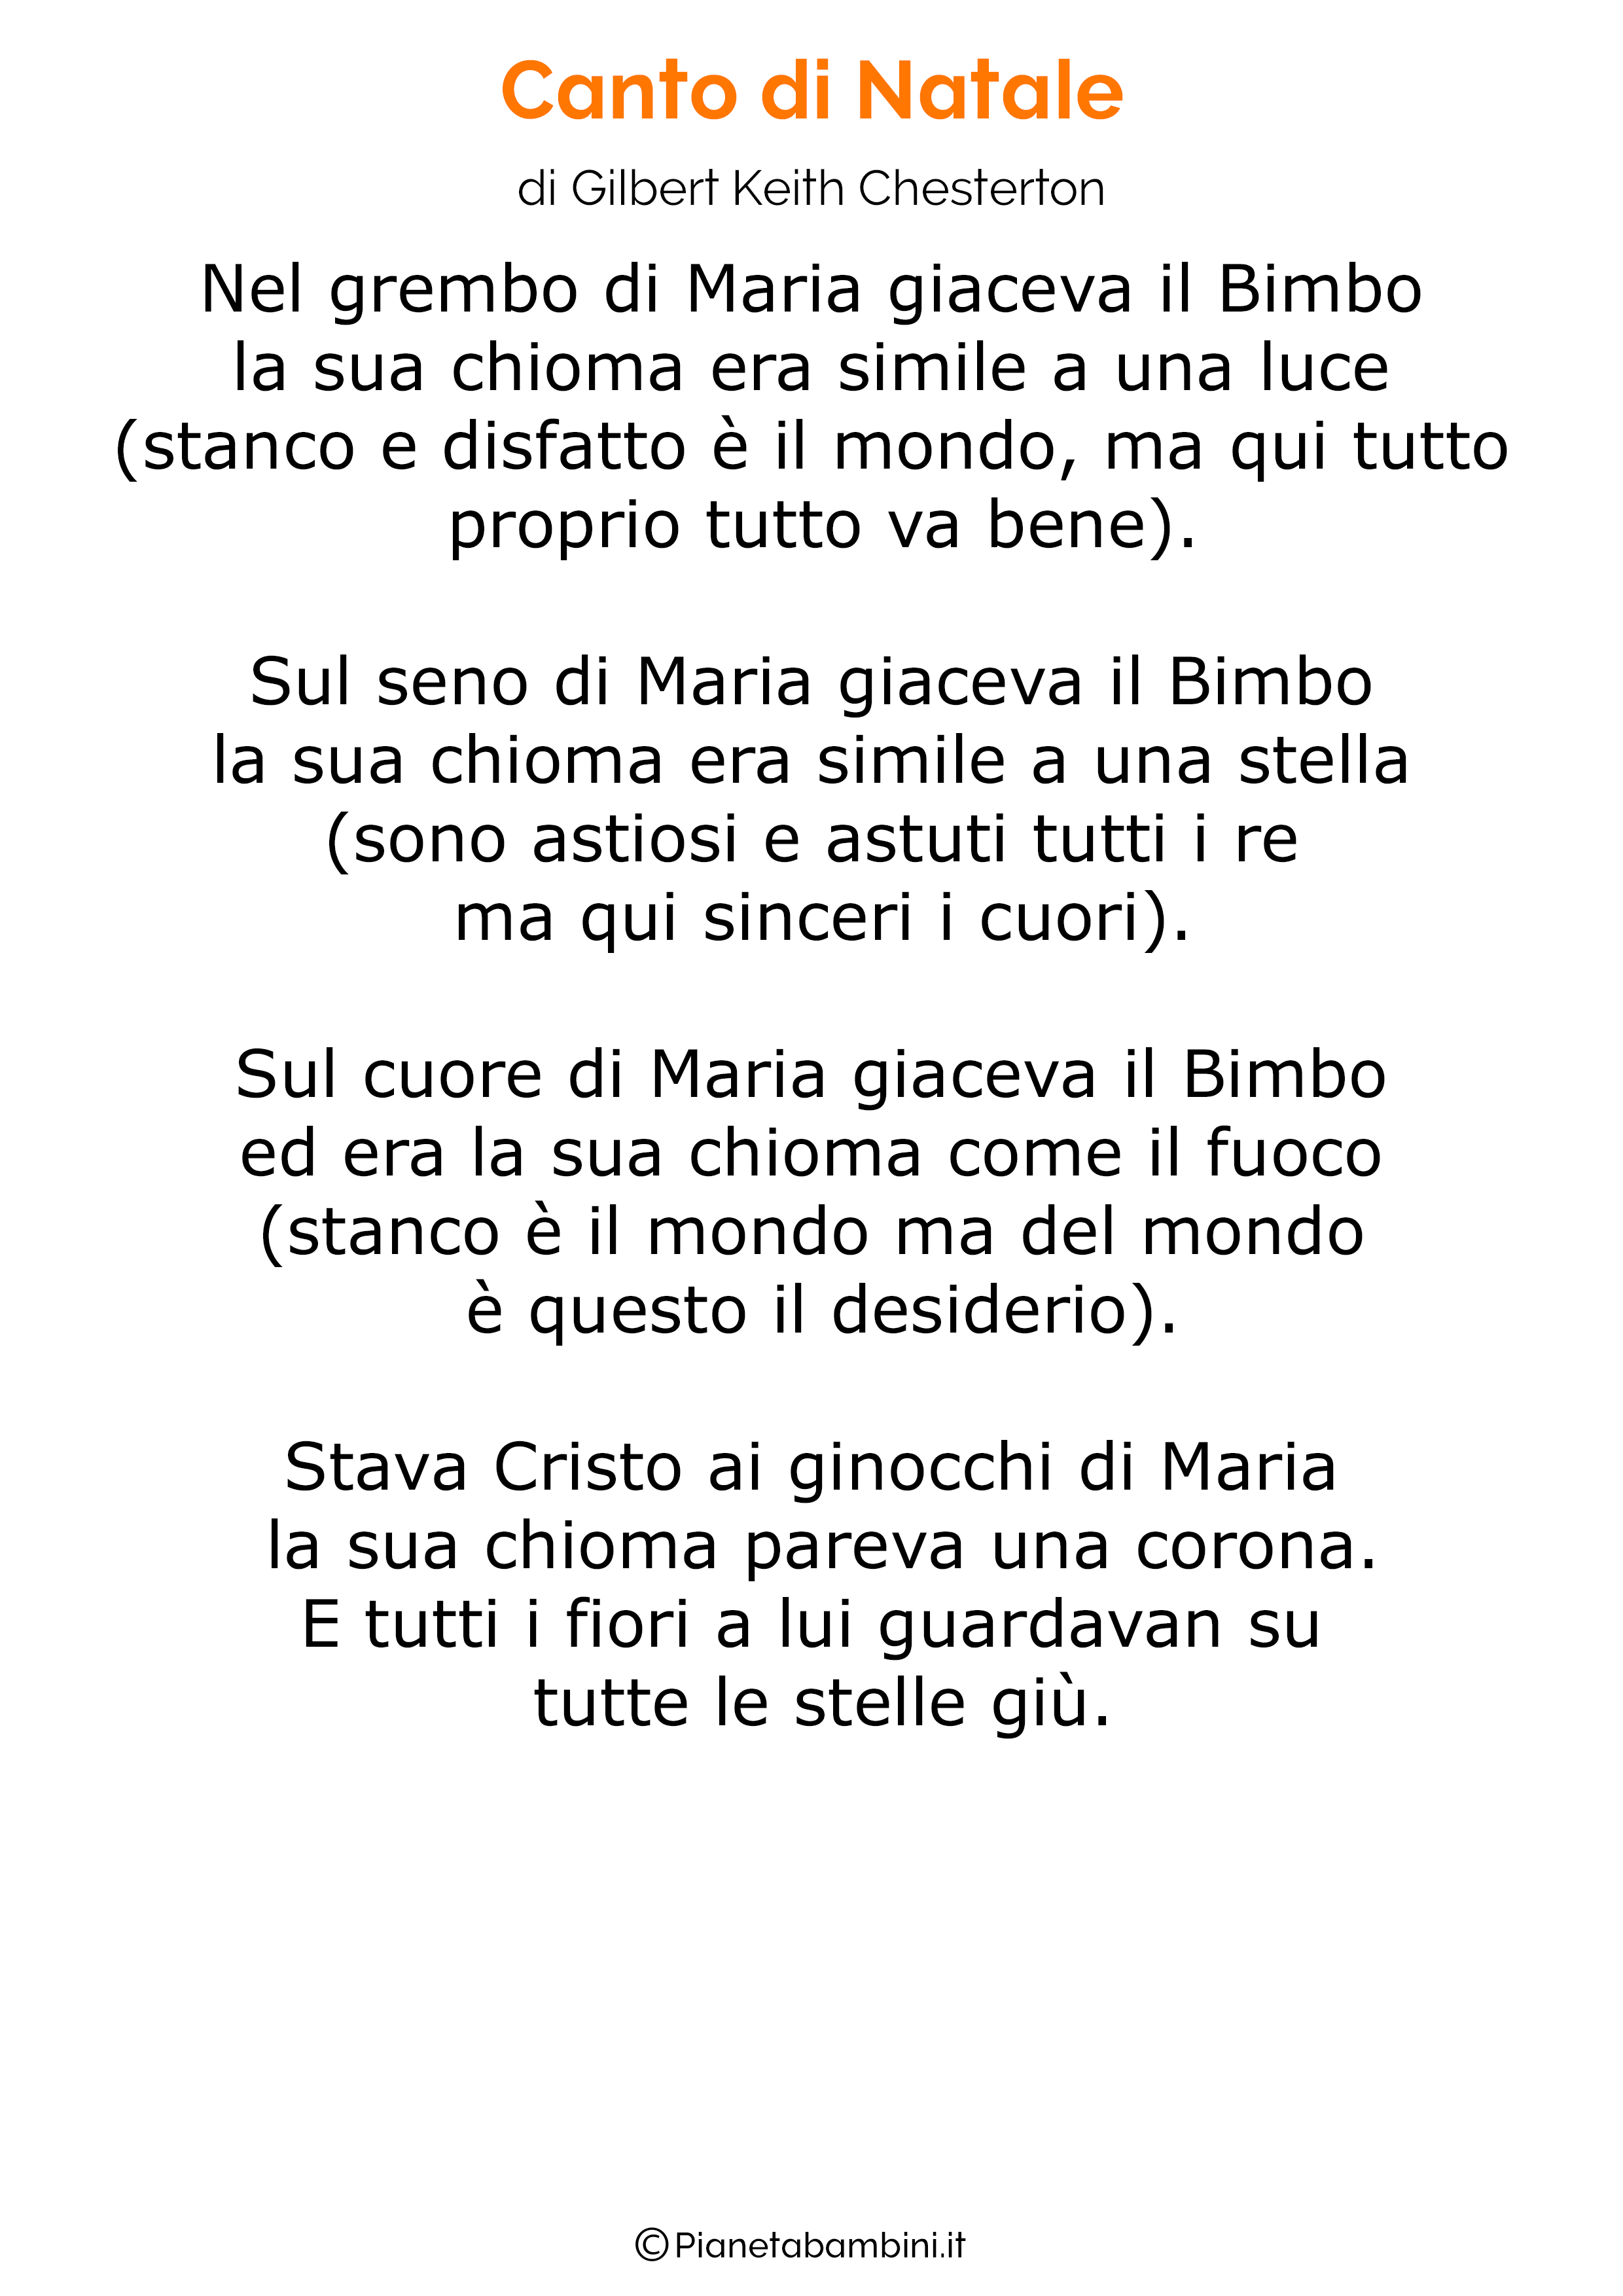 Poesia di Natale autori classici 05